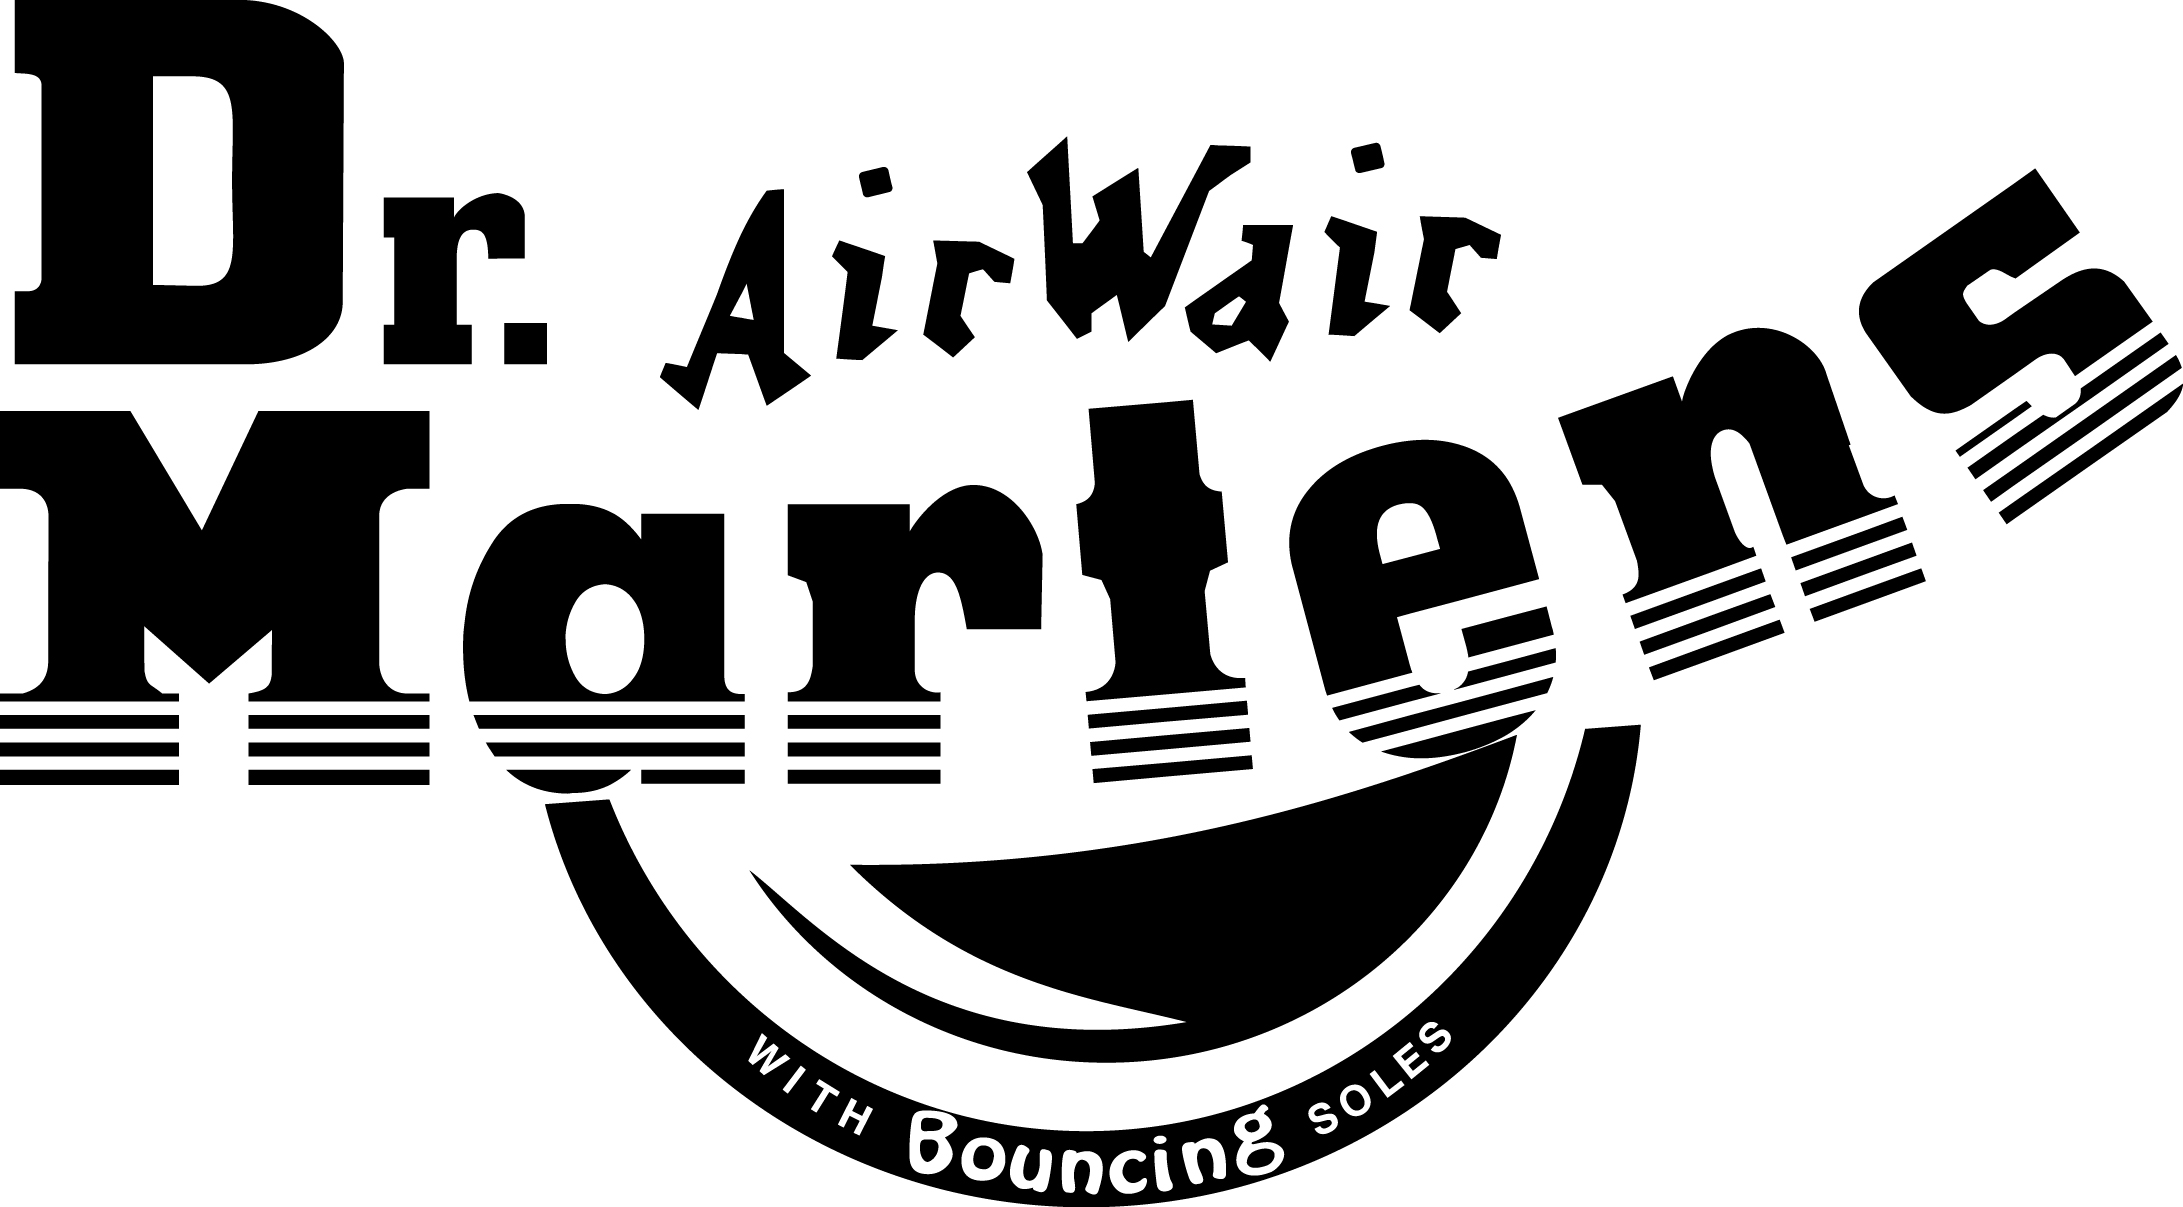 Dr. Martens - logo